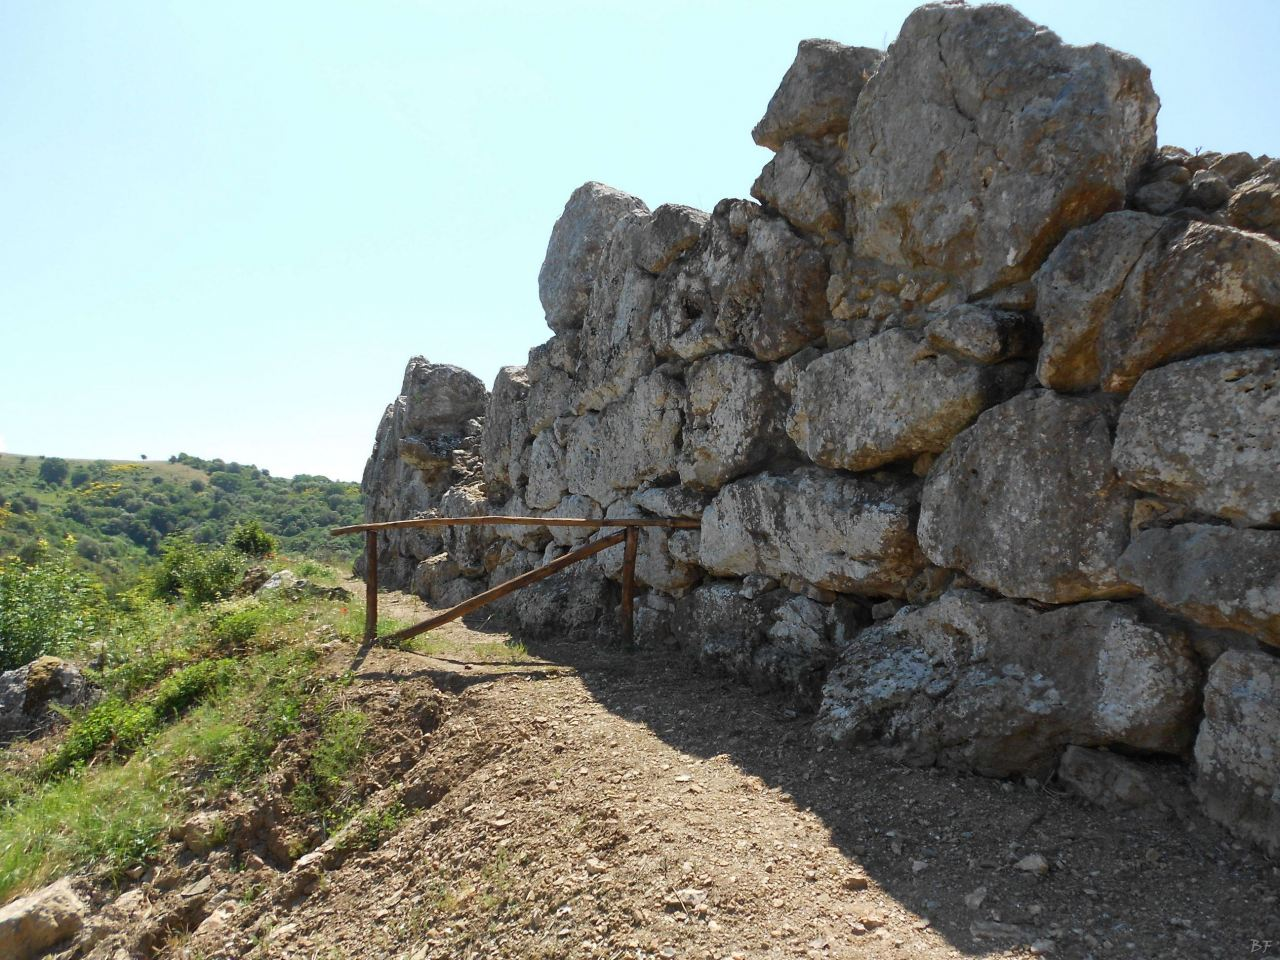 Roselle-Mura-Megalitiche-Roselle-Grosseto-Toscana-Italia-26